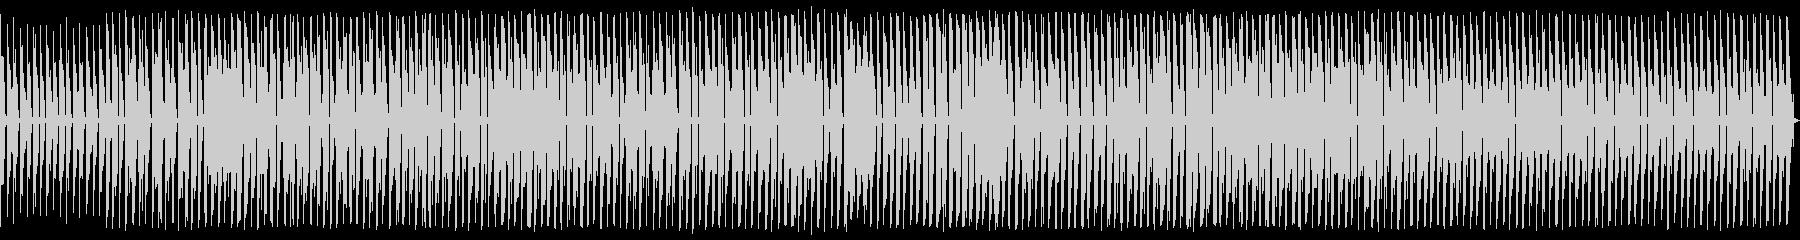 EDM。 90年代のサウンド。気に...の未再生の波形